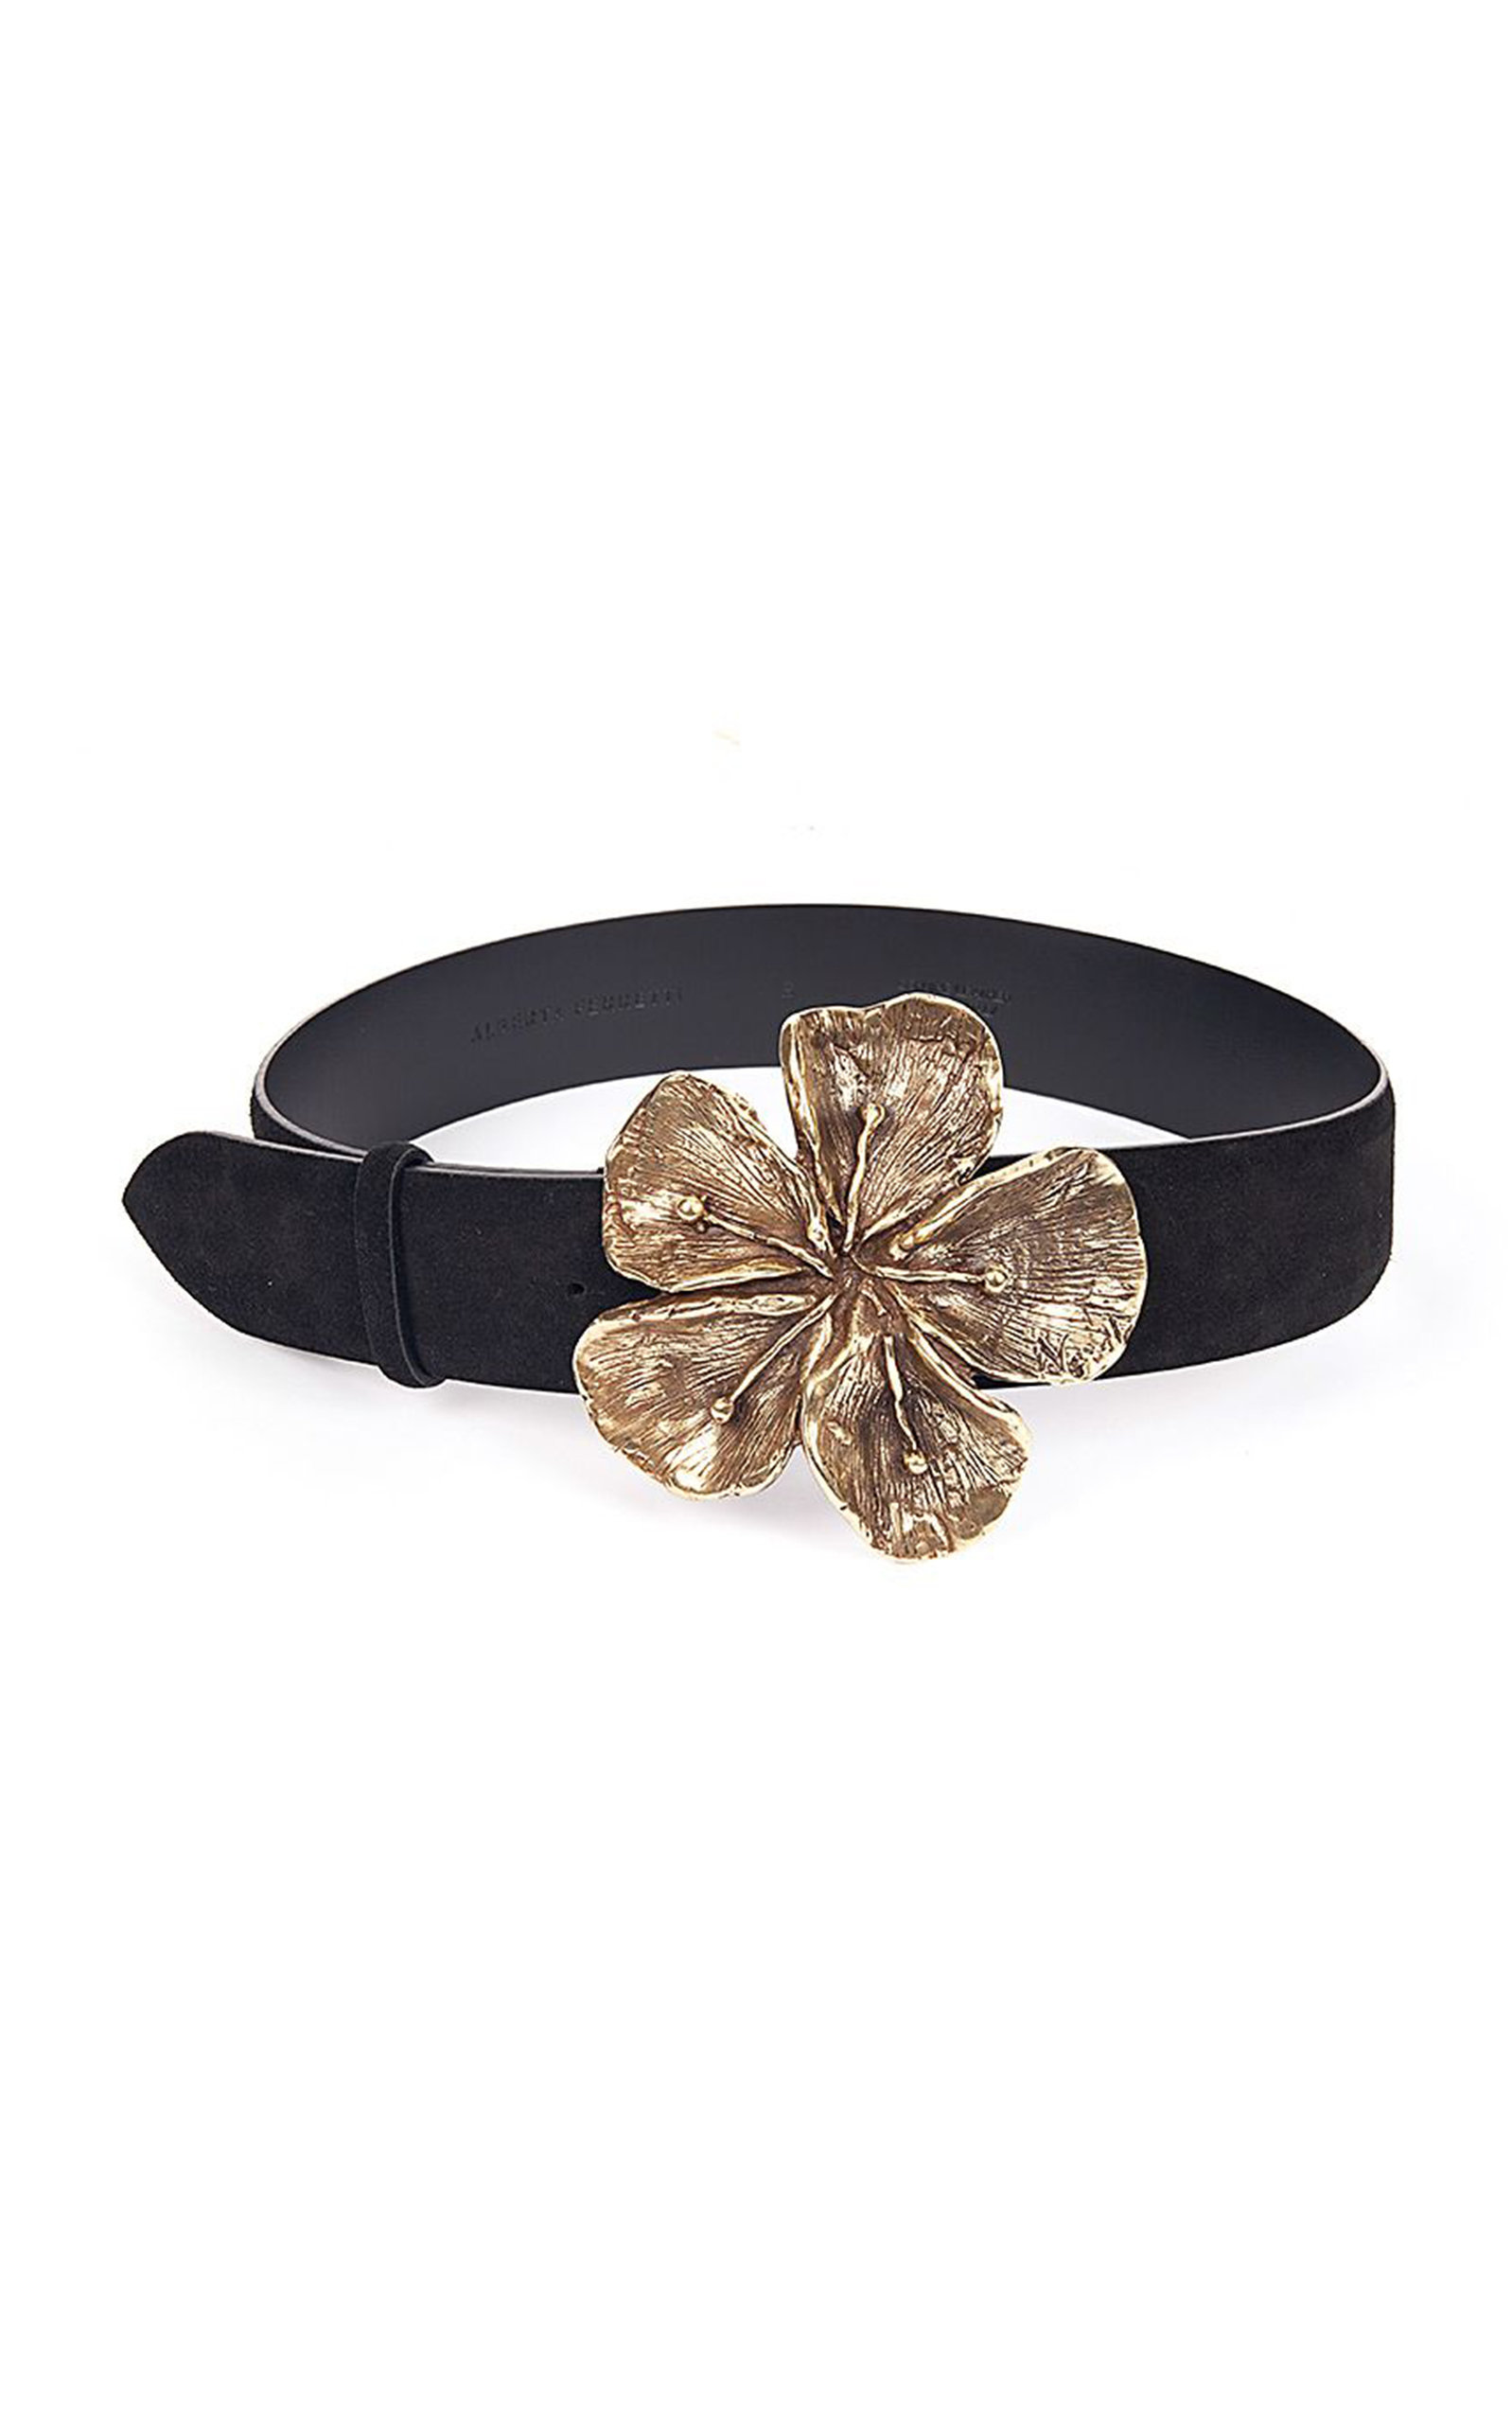 Alberta Ferretti Women's Hibiscus Metal And Suede Calf Leather Belt In Black